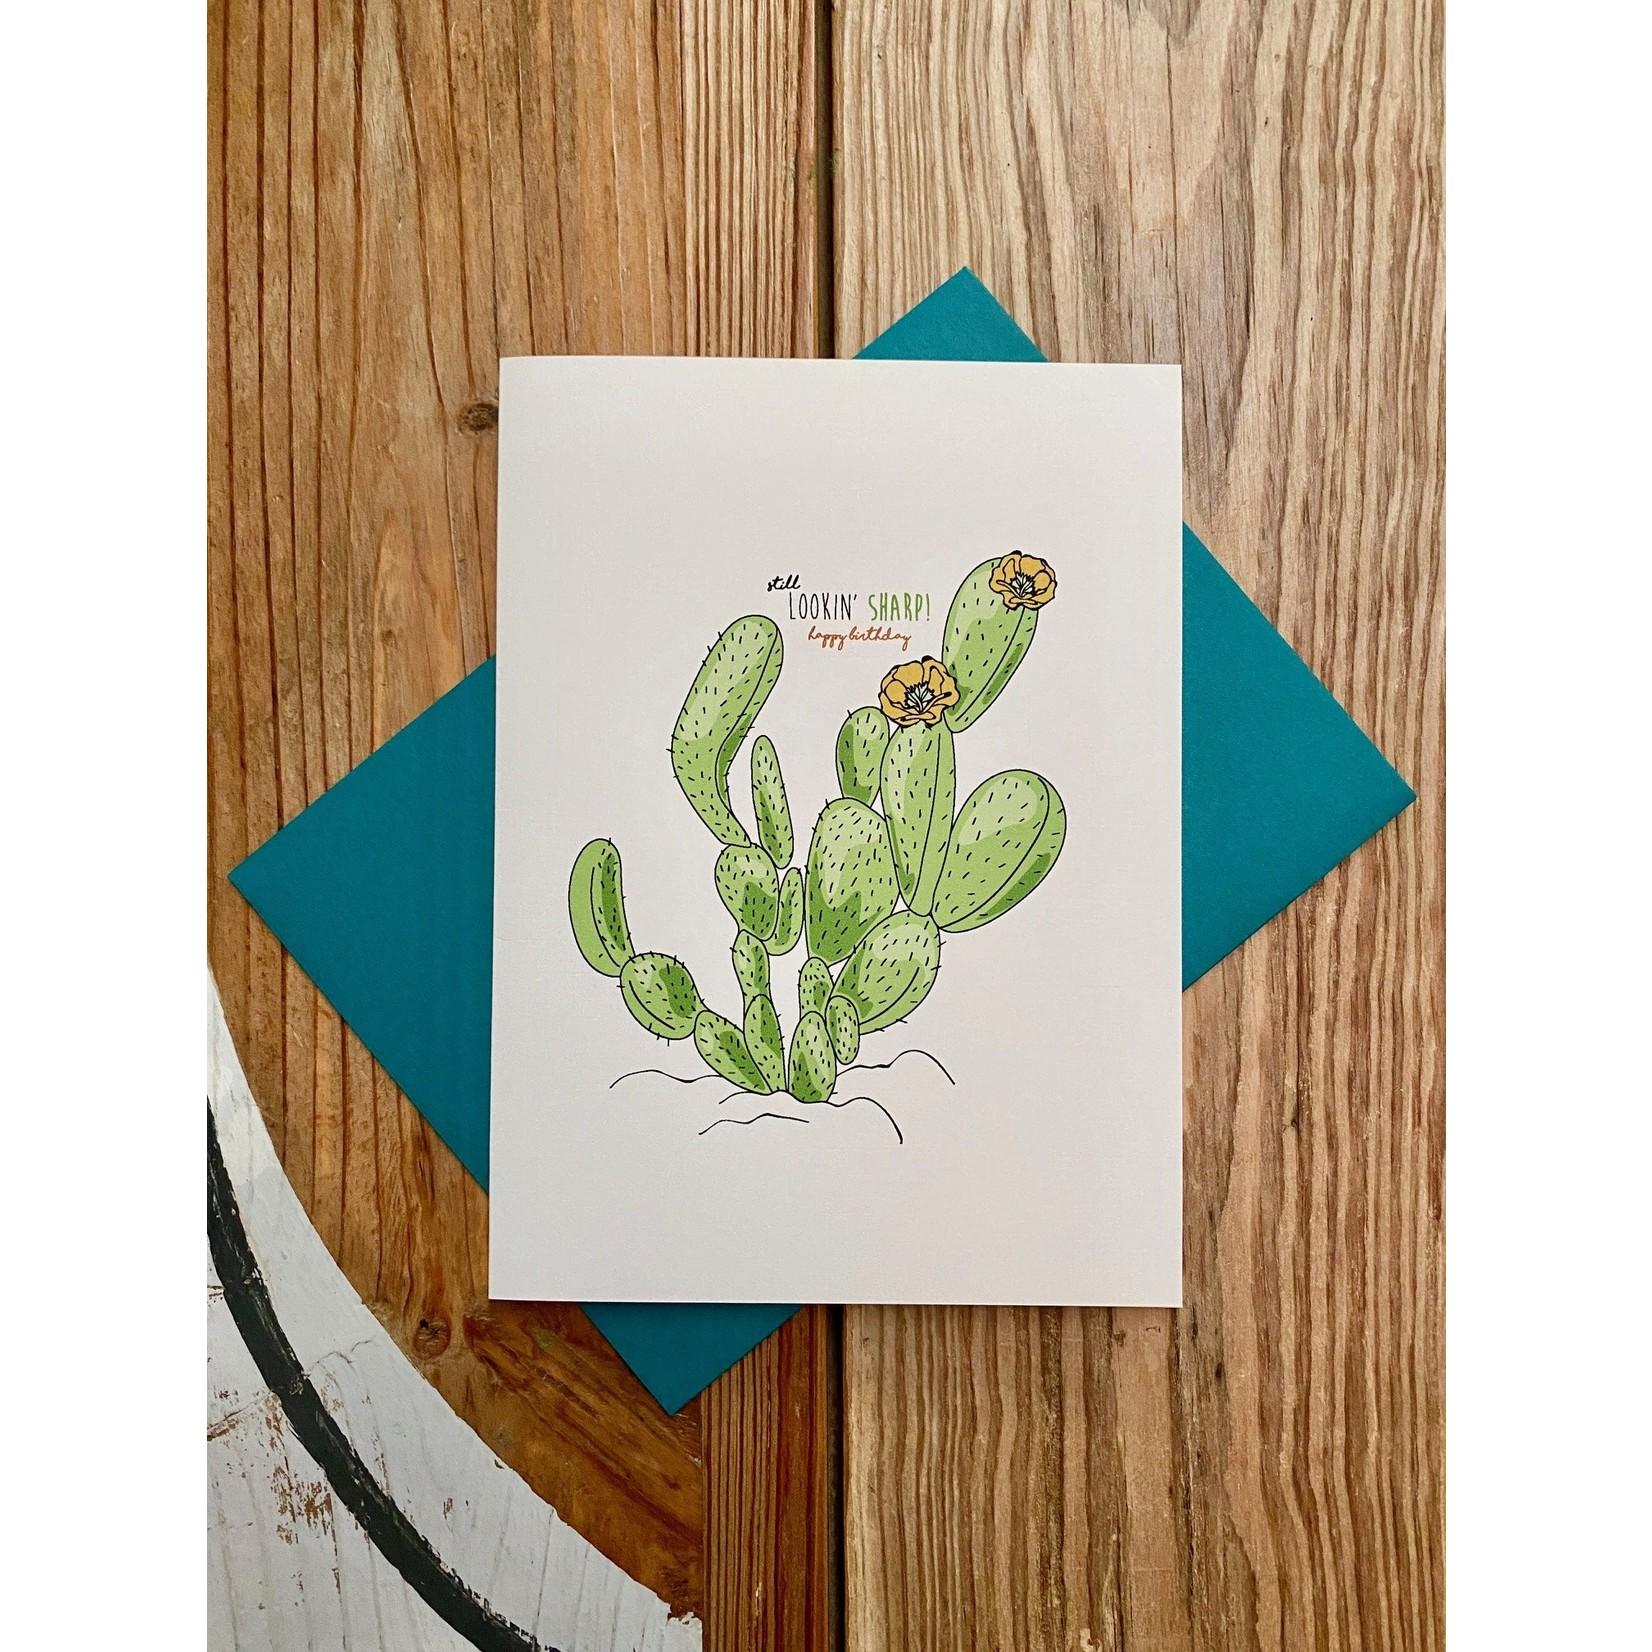 Artery Ink Nopalitos Cactus Lookin' Sharp Birthday Greeting Card